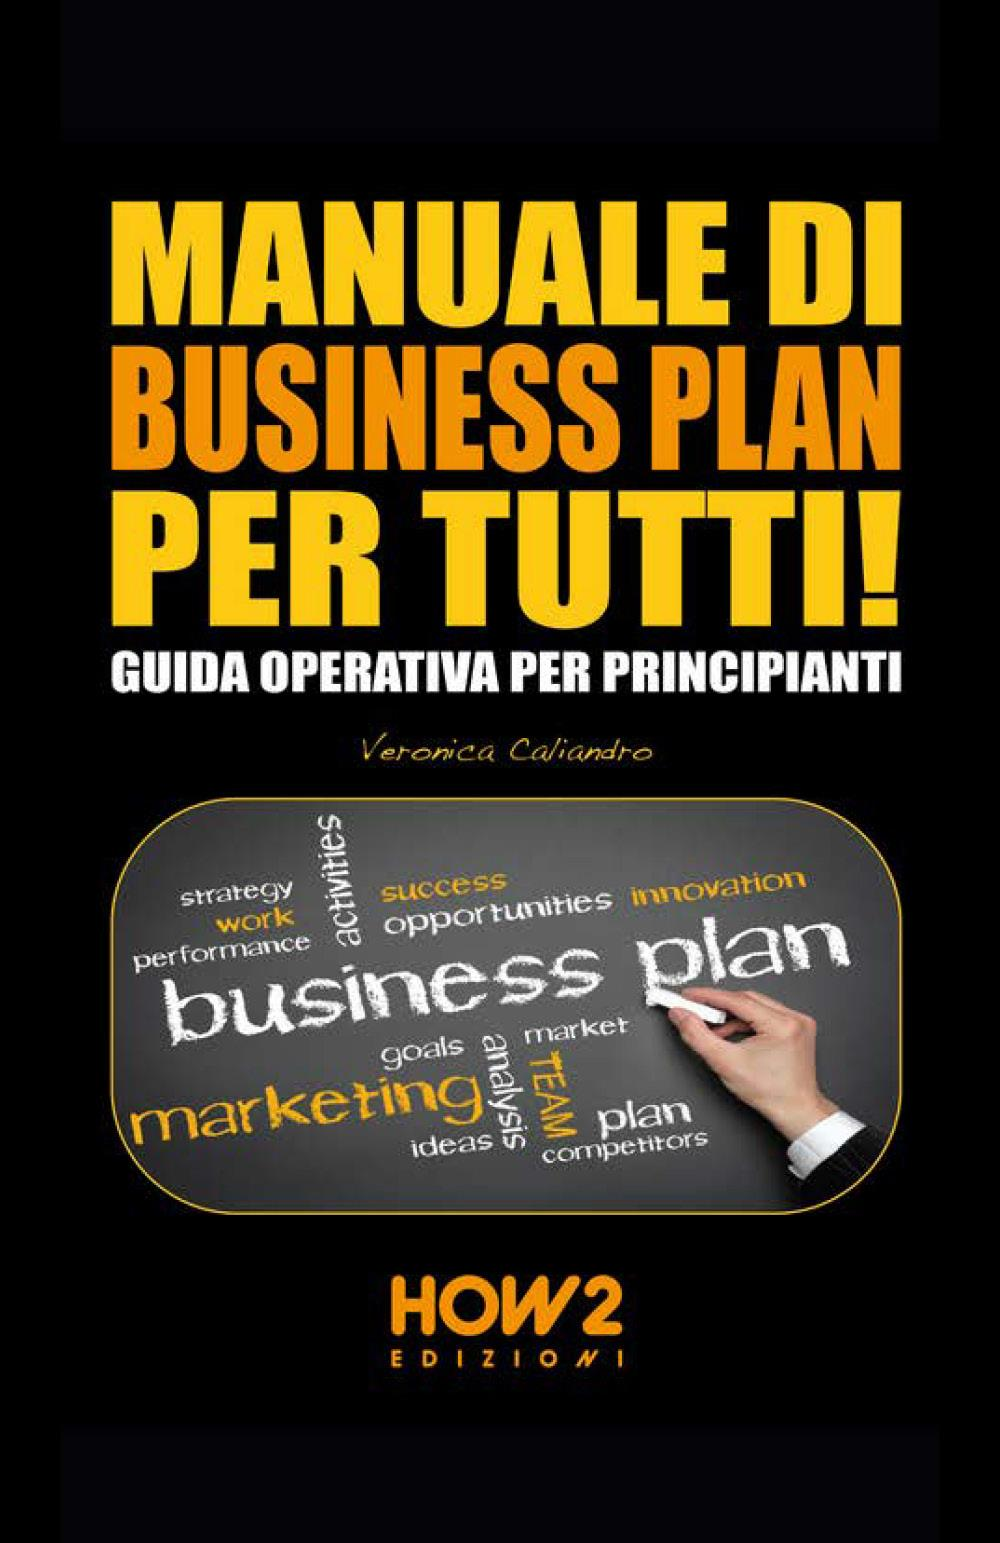 Manuale di business plan per tutti! Guida operativa per principianti